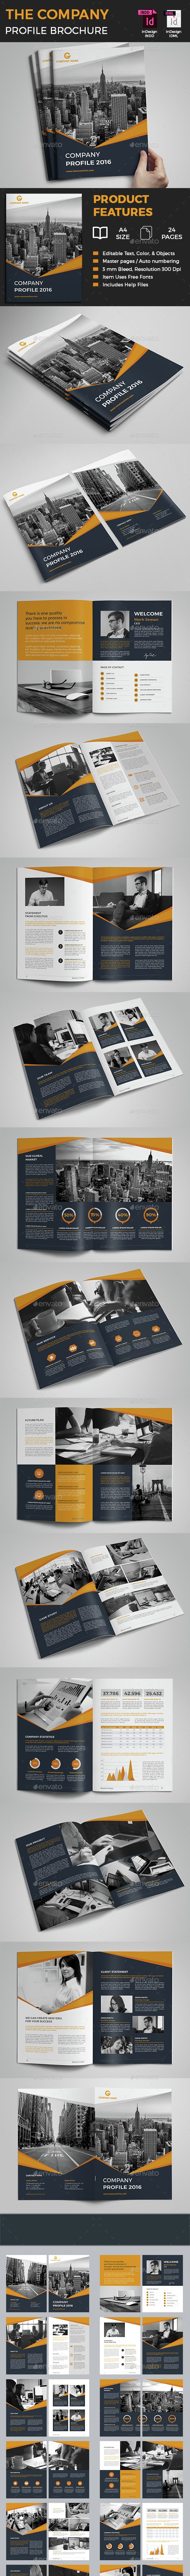 The Company Profile - Corporate Brochures